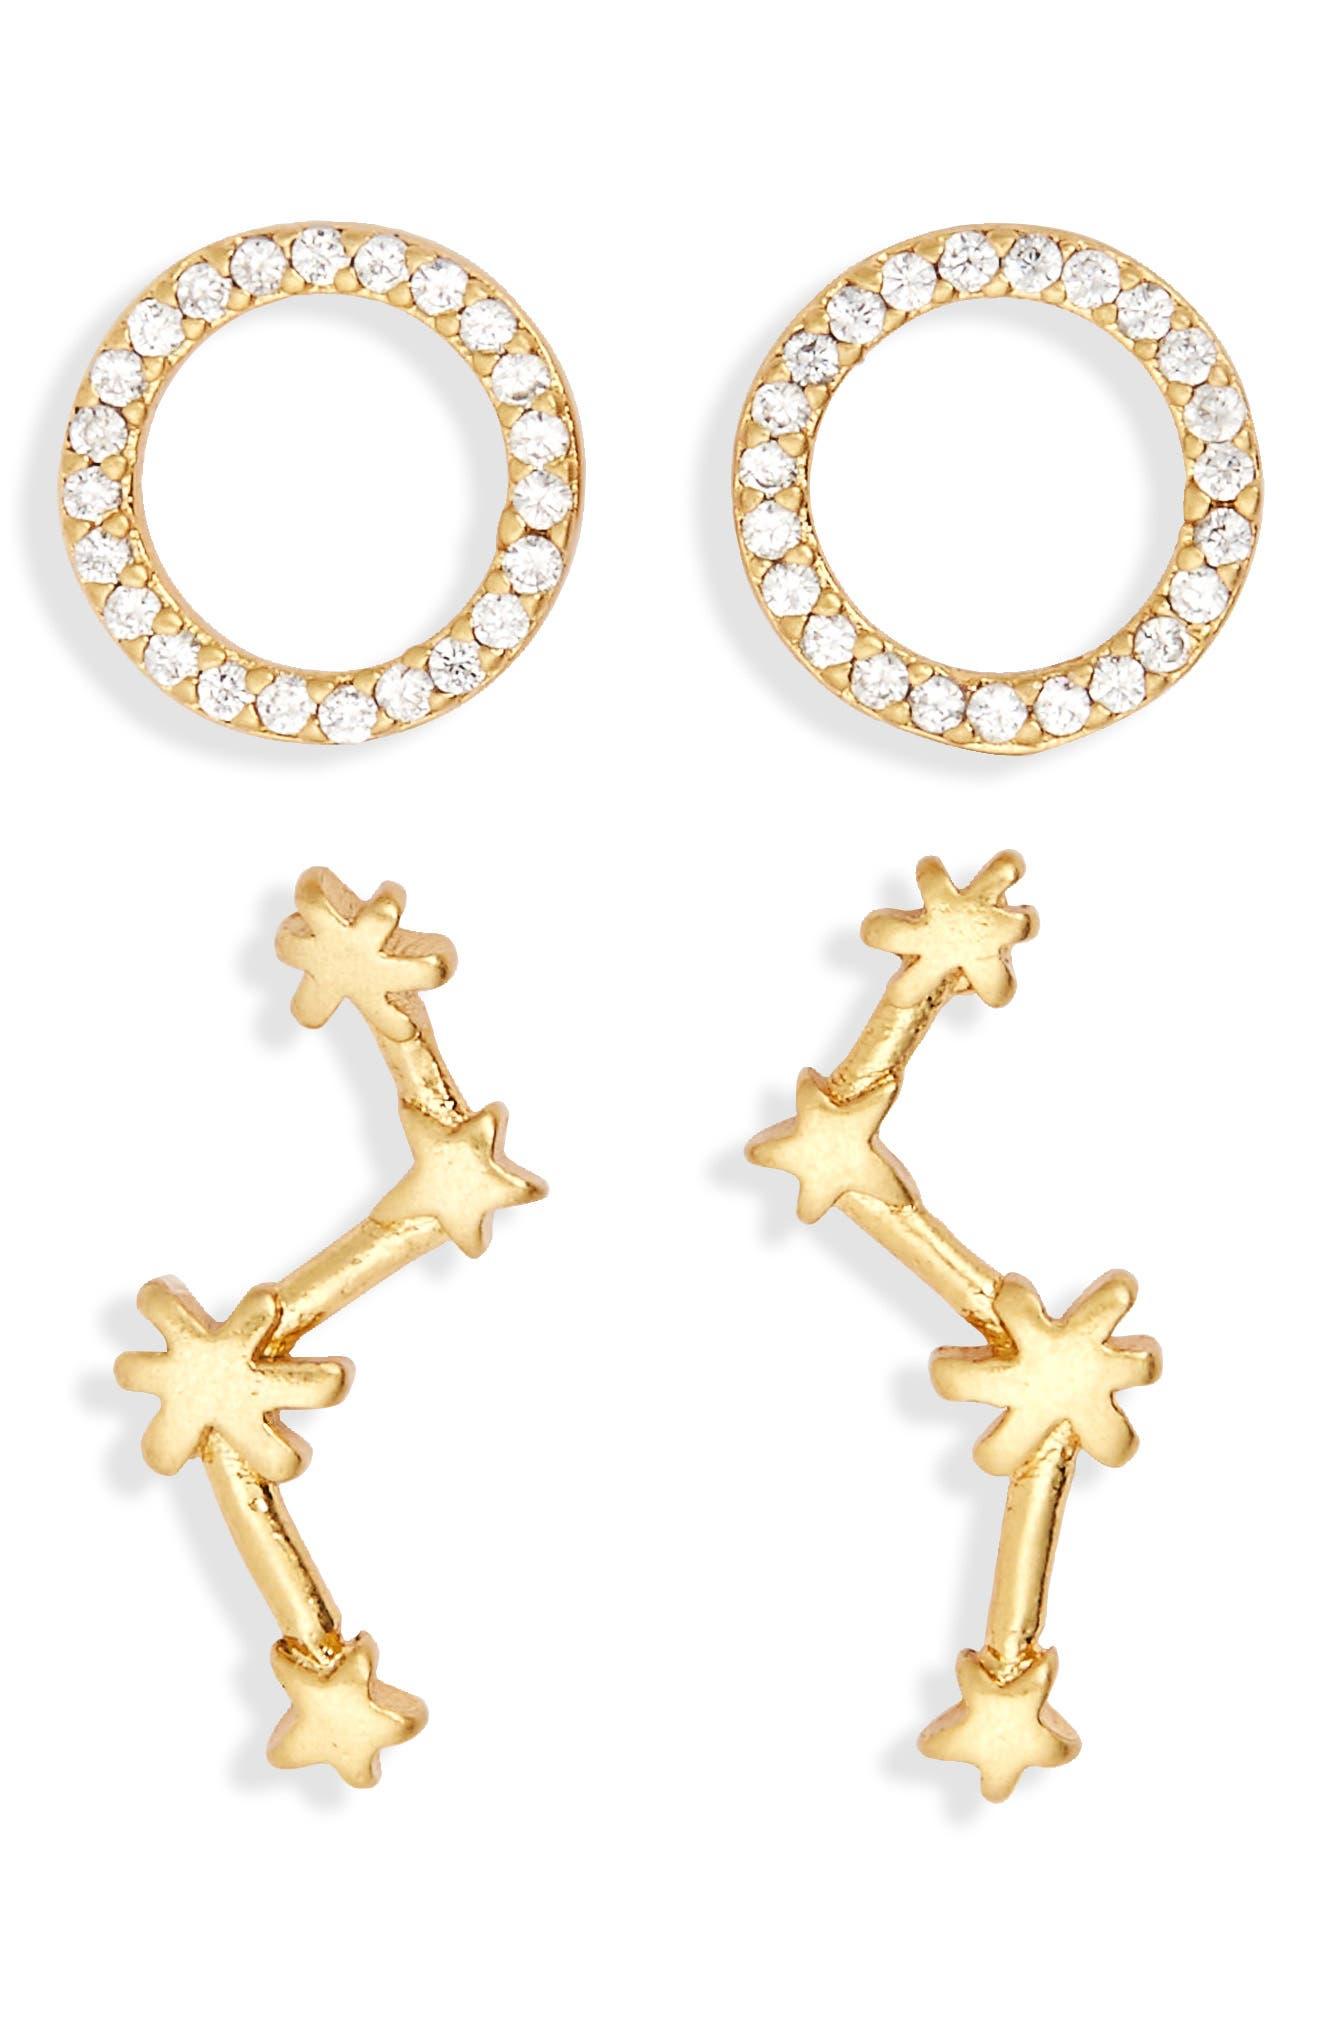 Alternate Image 1 Selected - Madewell Set of 2 Mismatched Stud Earrings